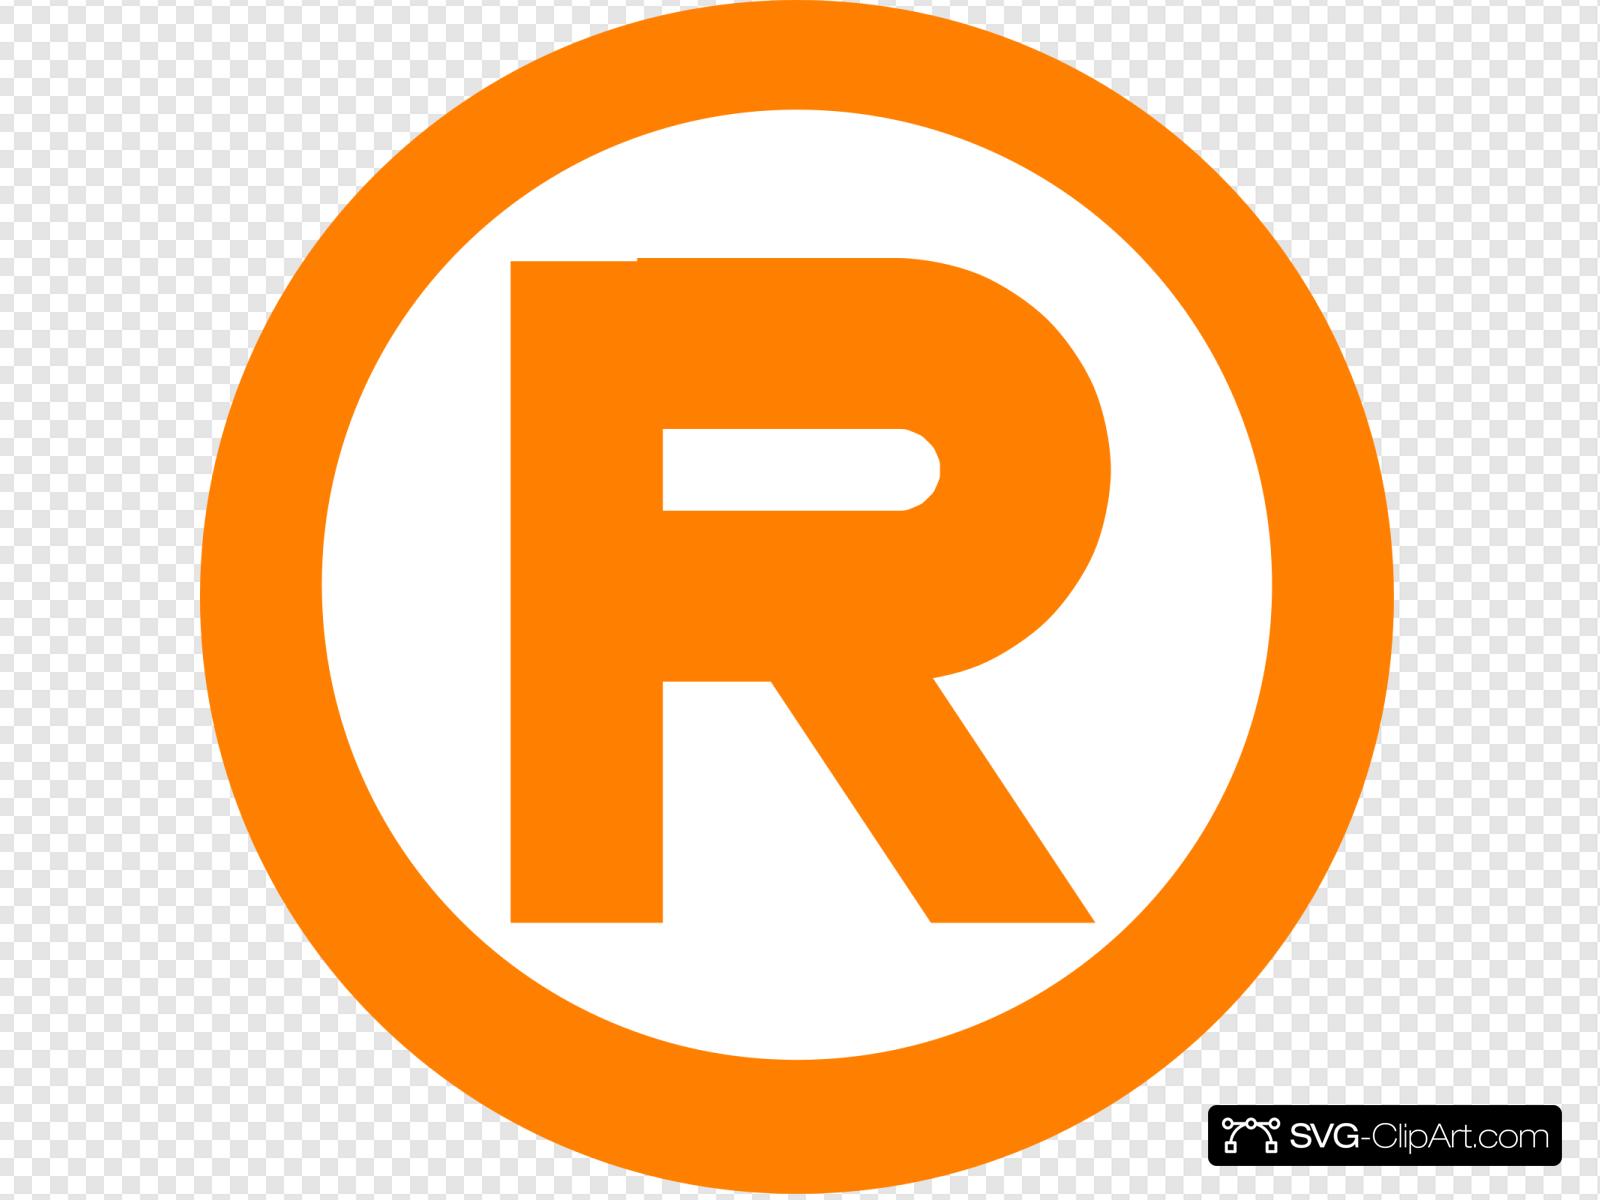 Orange Registered Mark Clip art, Icon and SVG.